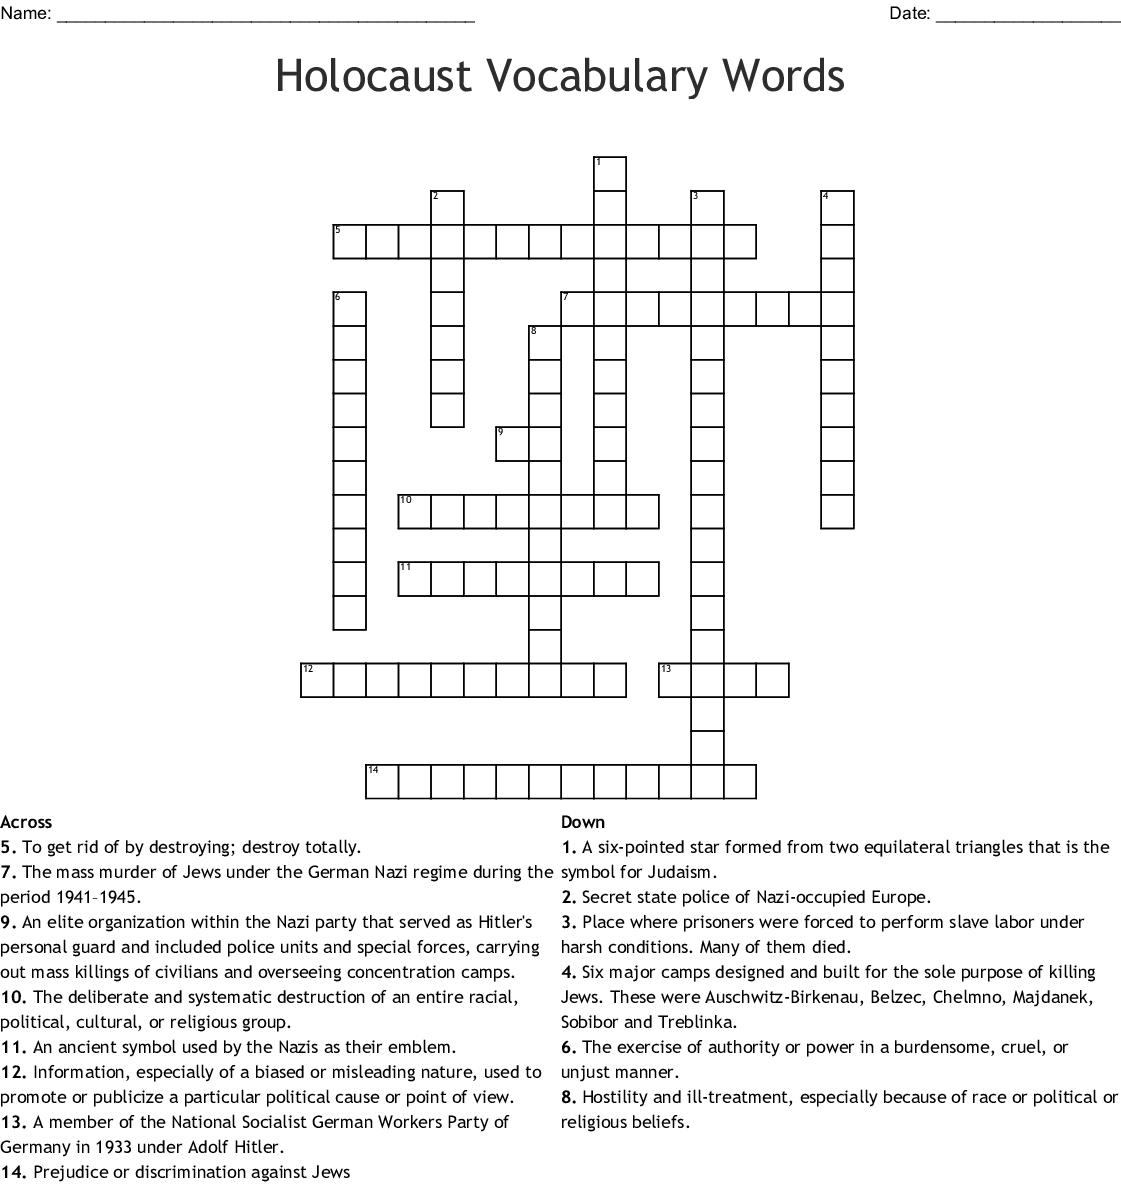 Holocaust Vocabulary Words Crossword